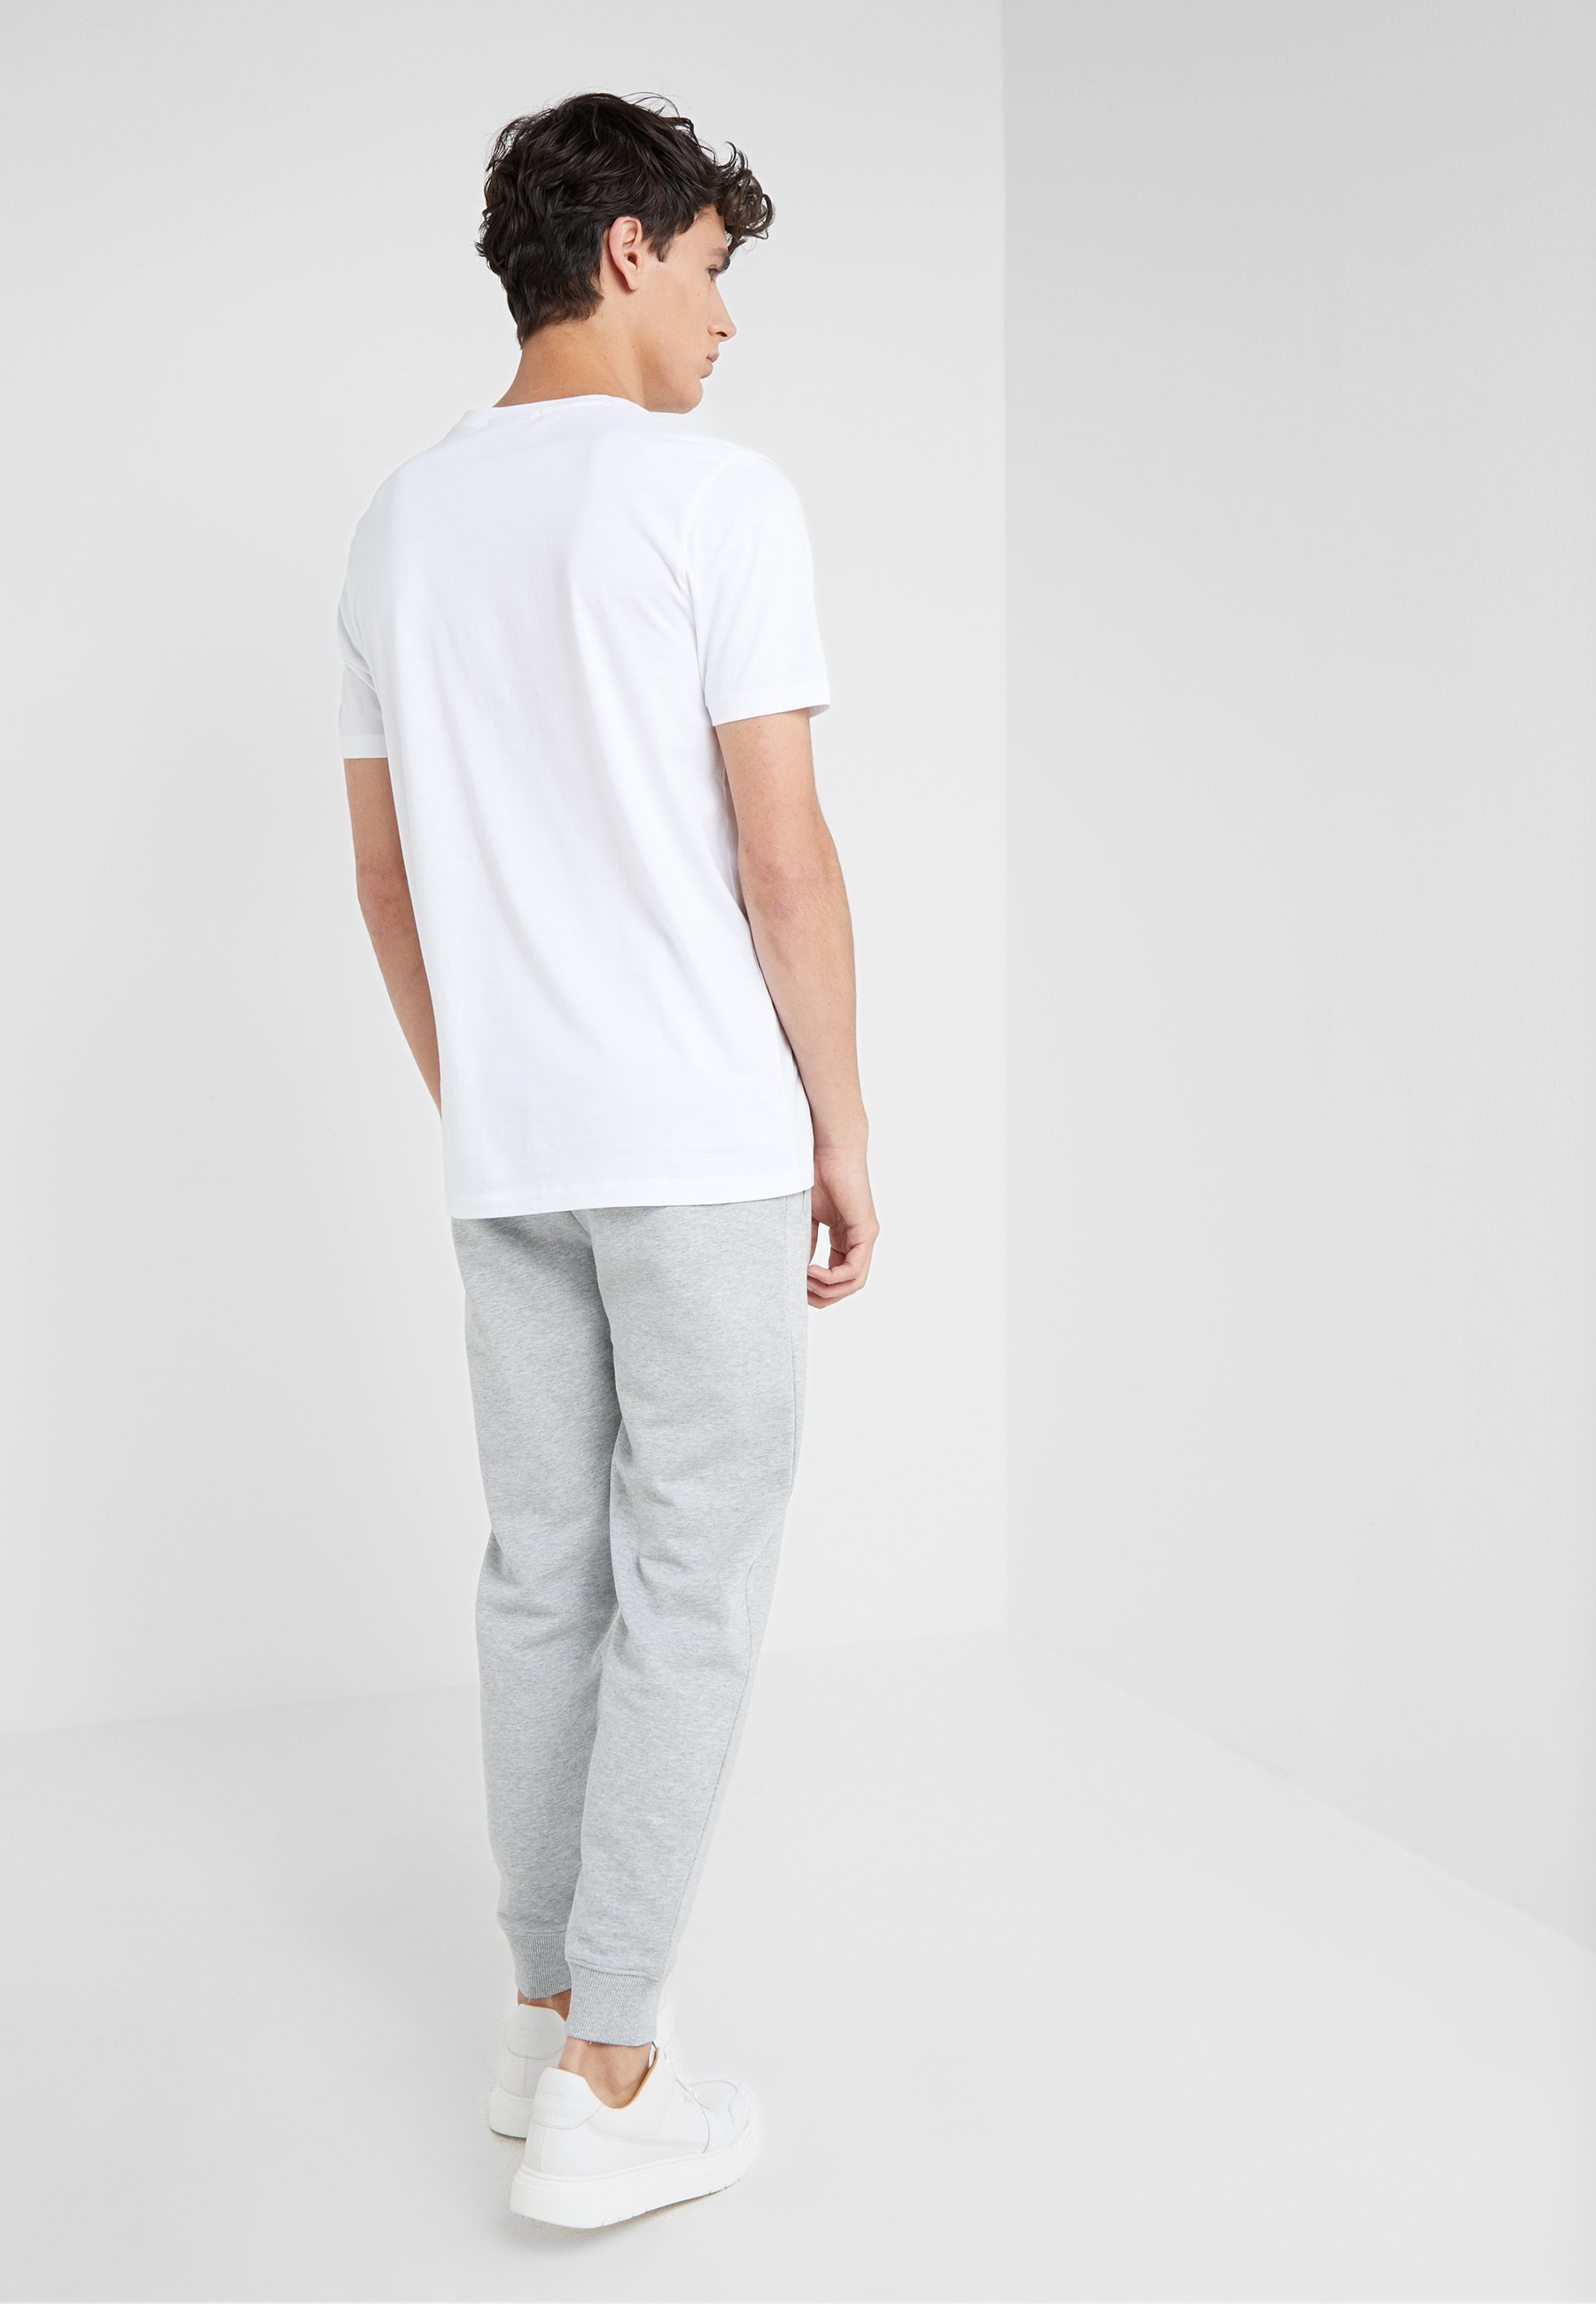 DoakPantalon De Open Survêtement Grey Hugo nwvmyN80O